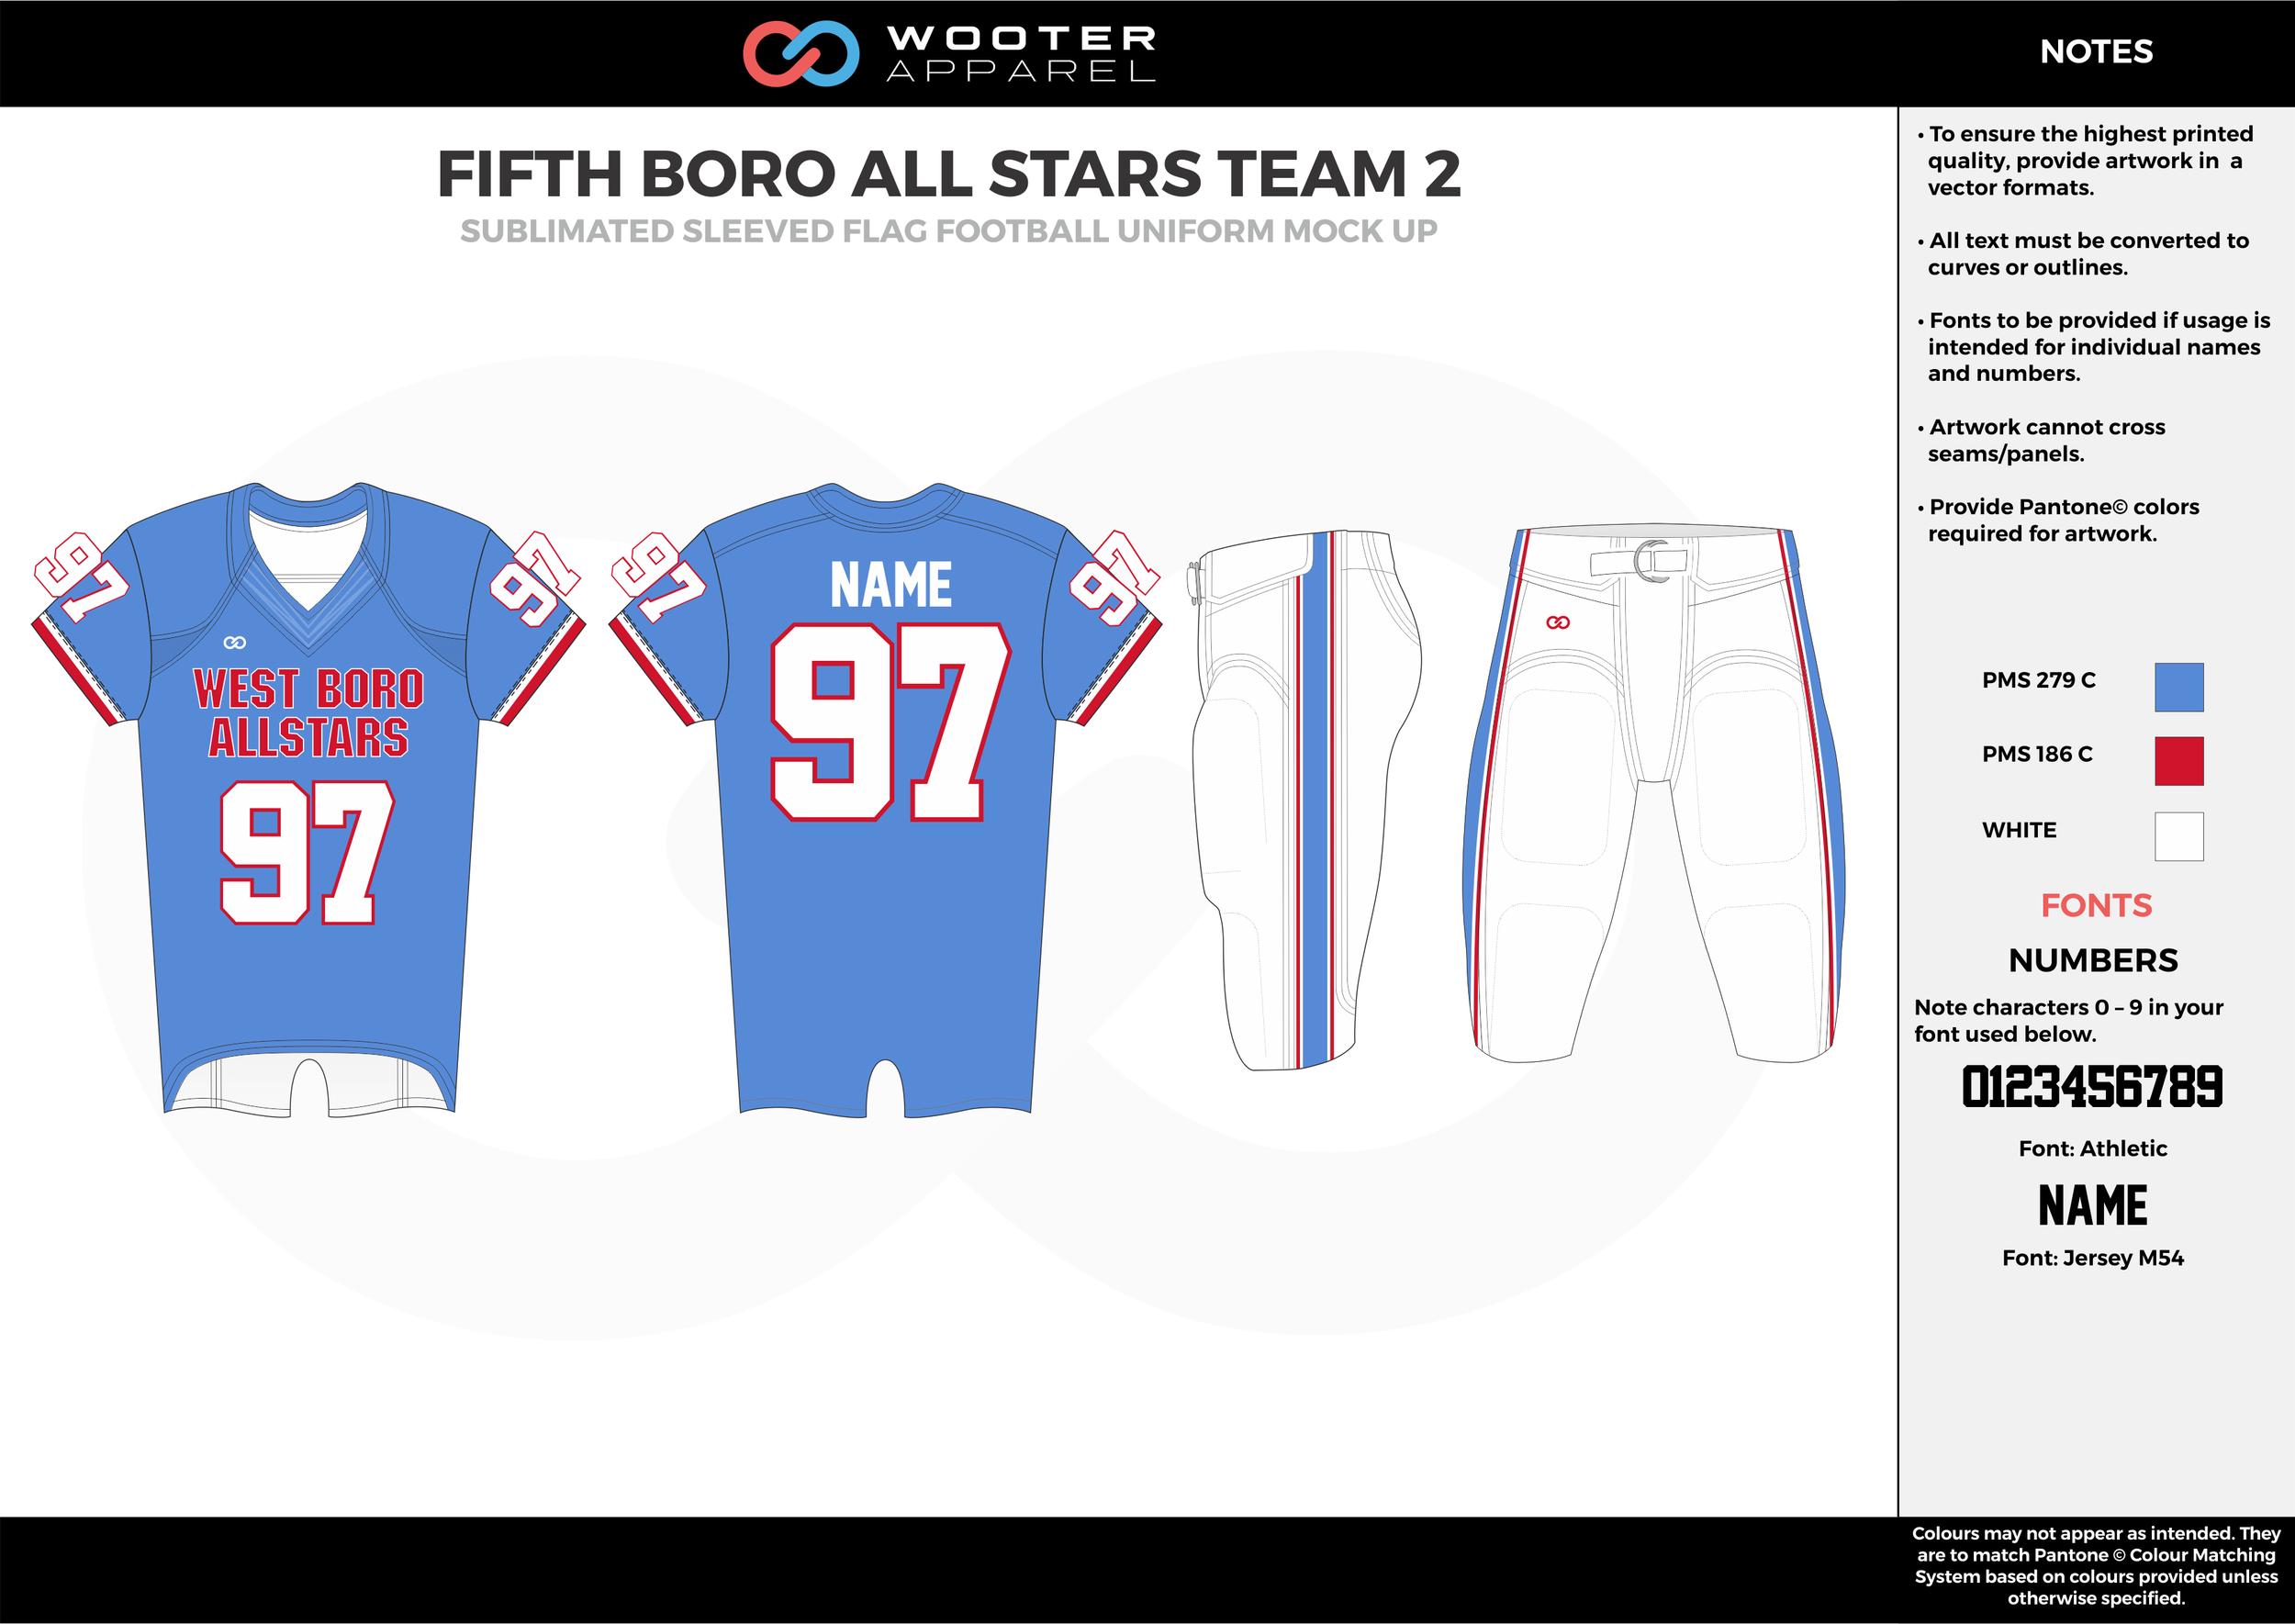 FIFTH BORO ALL STARS TEAM 2 blue red white flag football uniforms jerseys pants